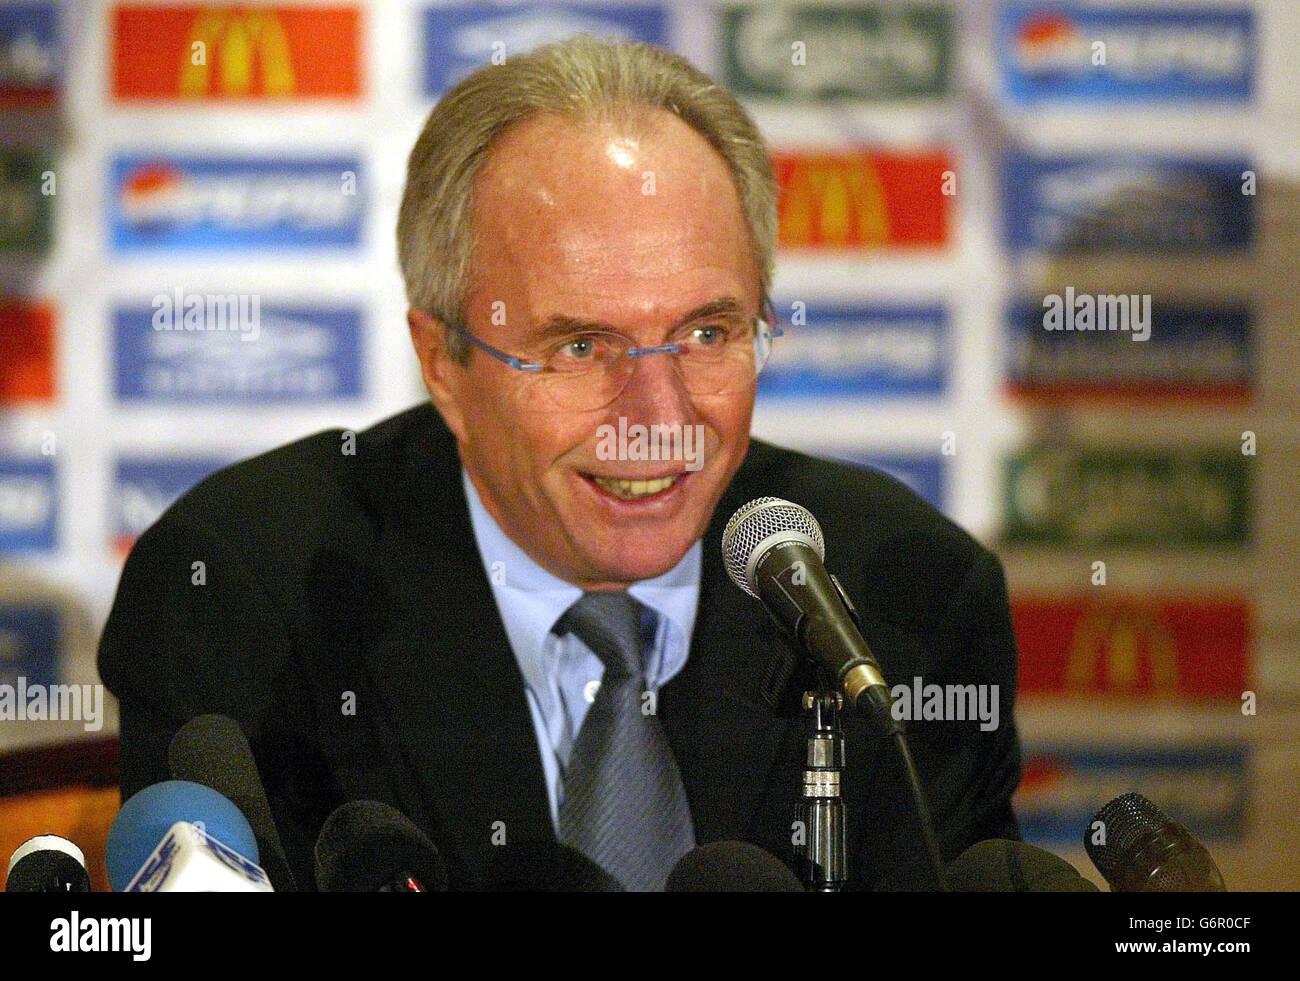 Sven Goran Erikisson during the press conference - Stock Image